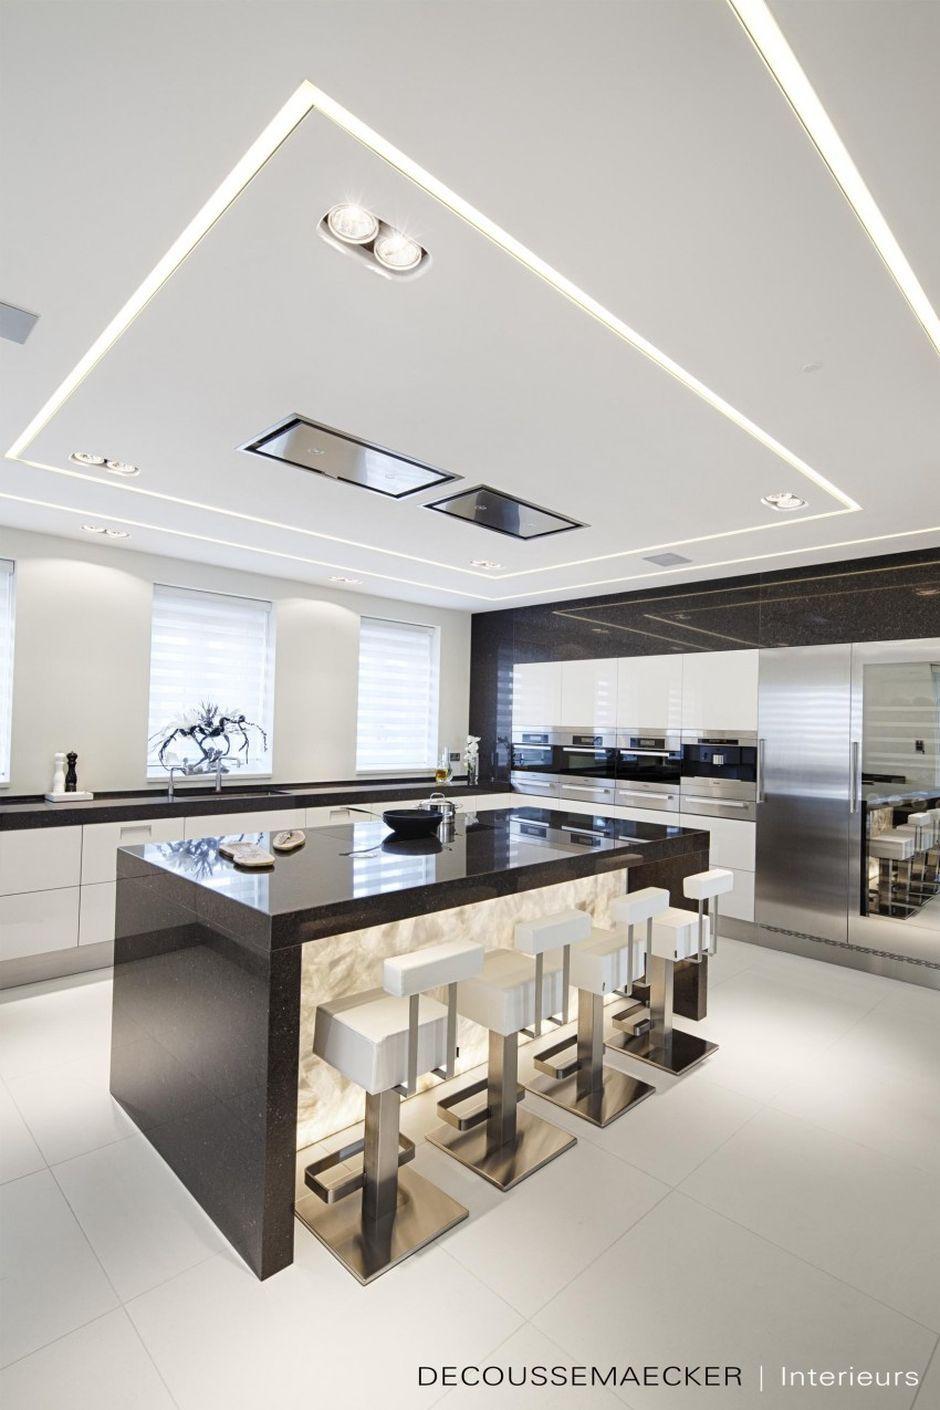 4 Best Modern Ceiling Design for Home Interior - Hoommy.com